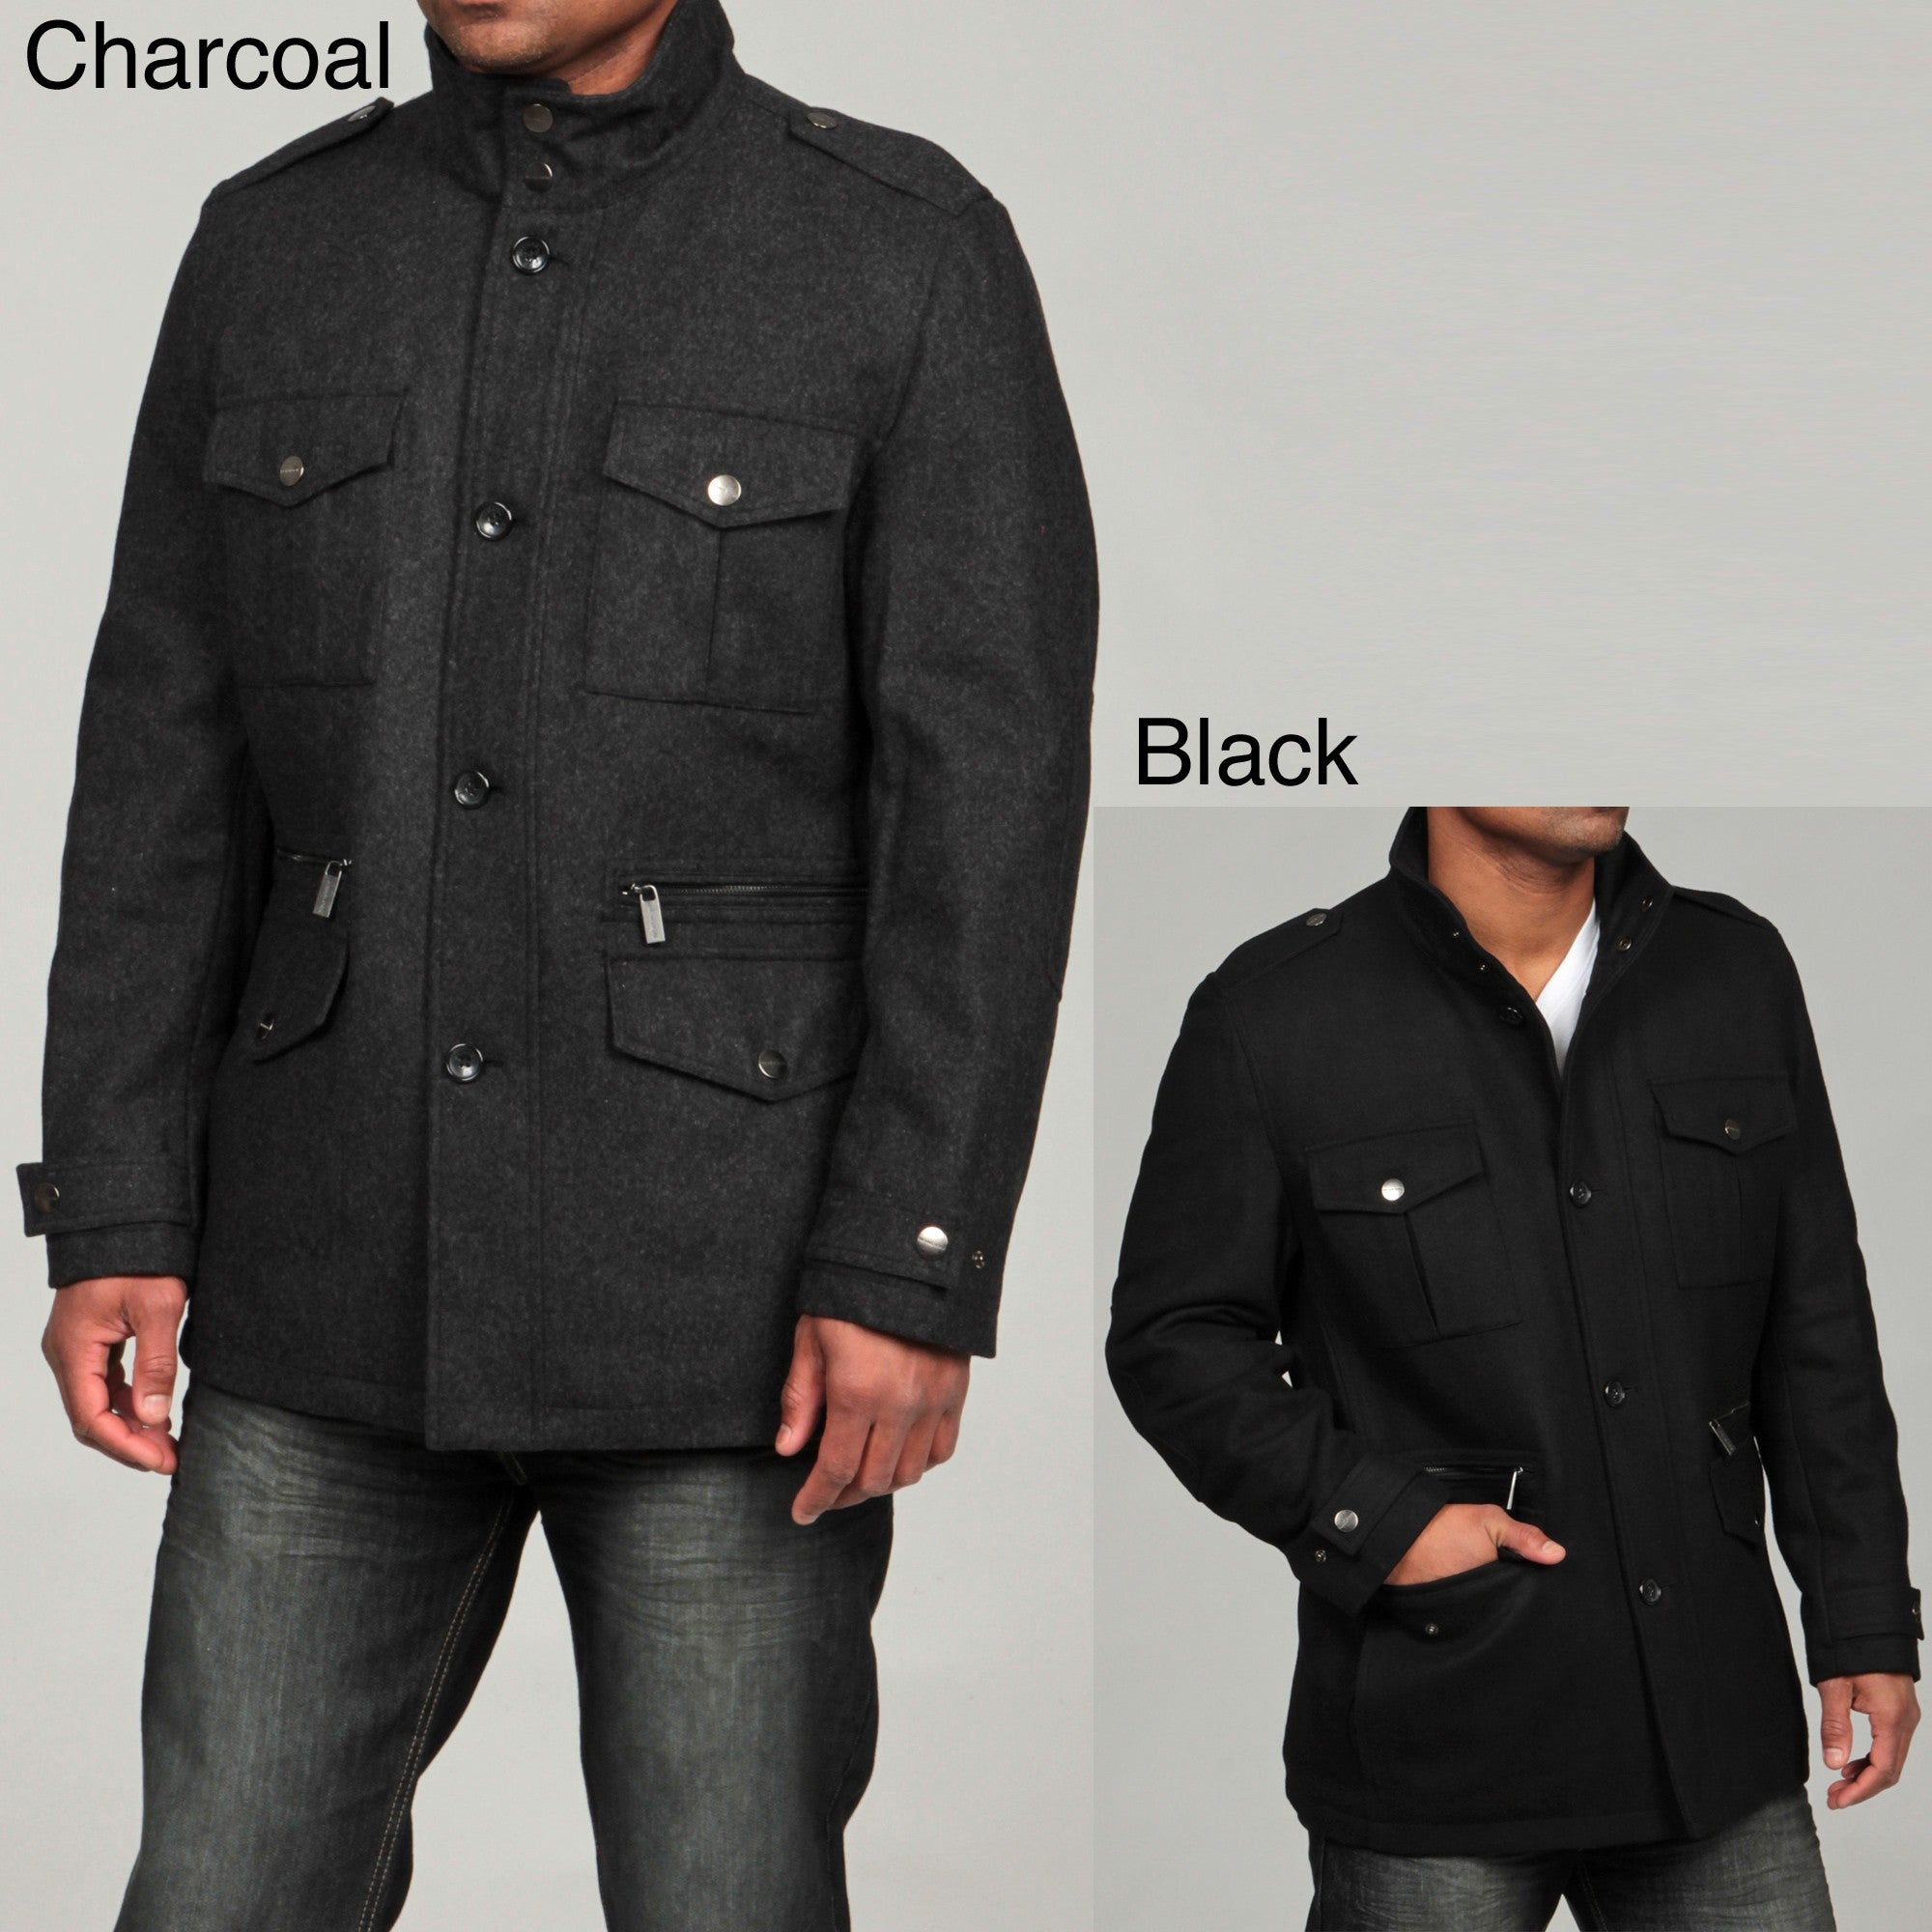 15817089023c Shop MICHAEL Michael Kors Men s Wool Blend Field Coat FINAL SALE - Free  Shipping On Orders Over  45 - Overstock - 6403100